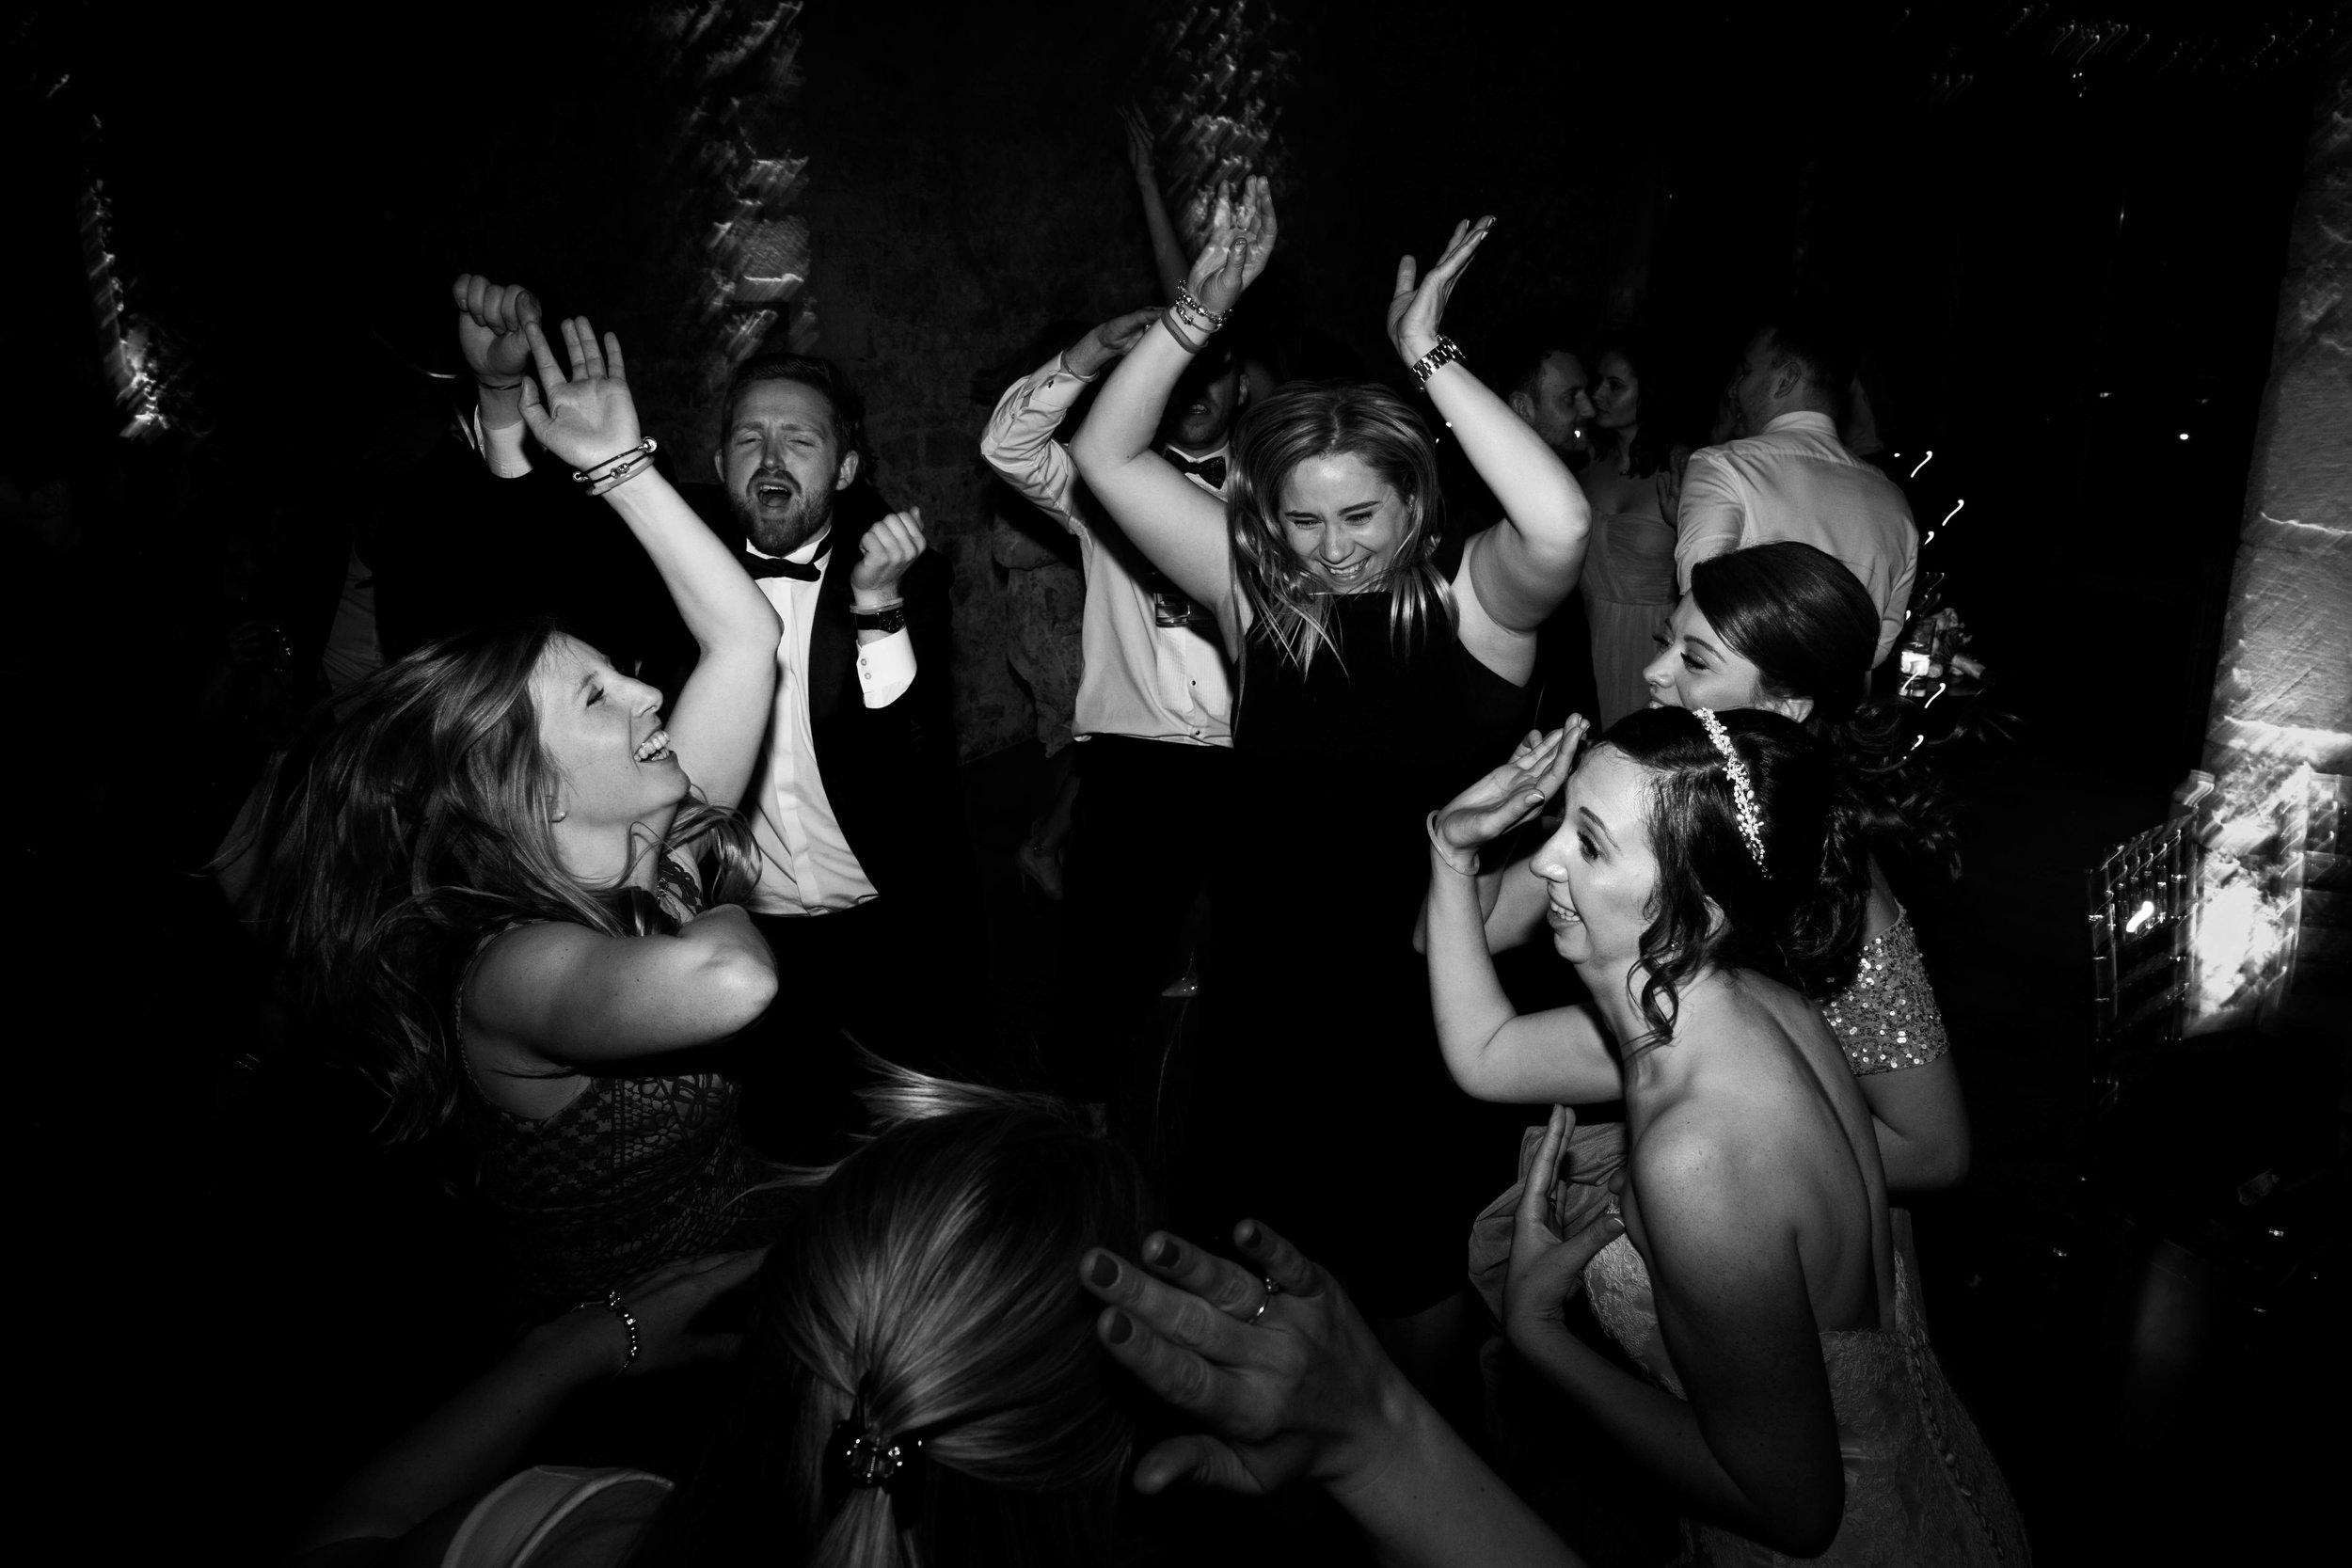 Notley_Abbey_Nick_Labrum_Photo_Kate&Matt_black and white-700.jpg